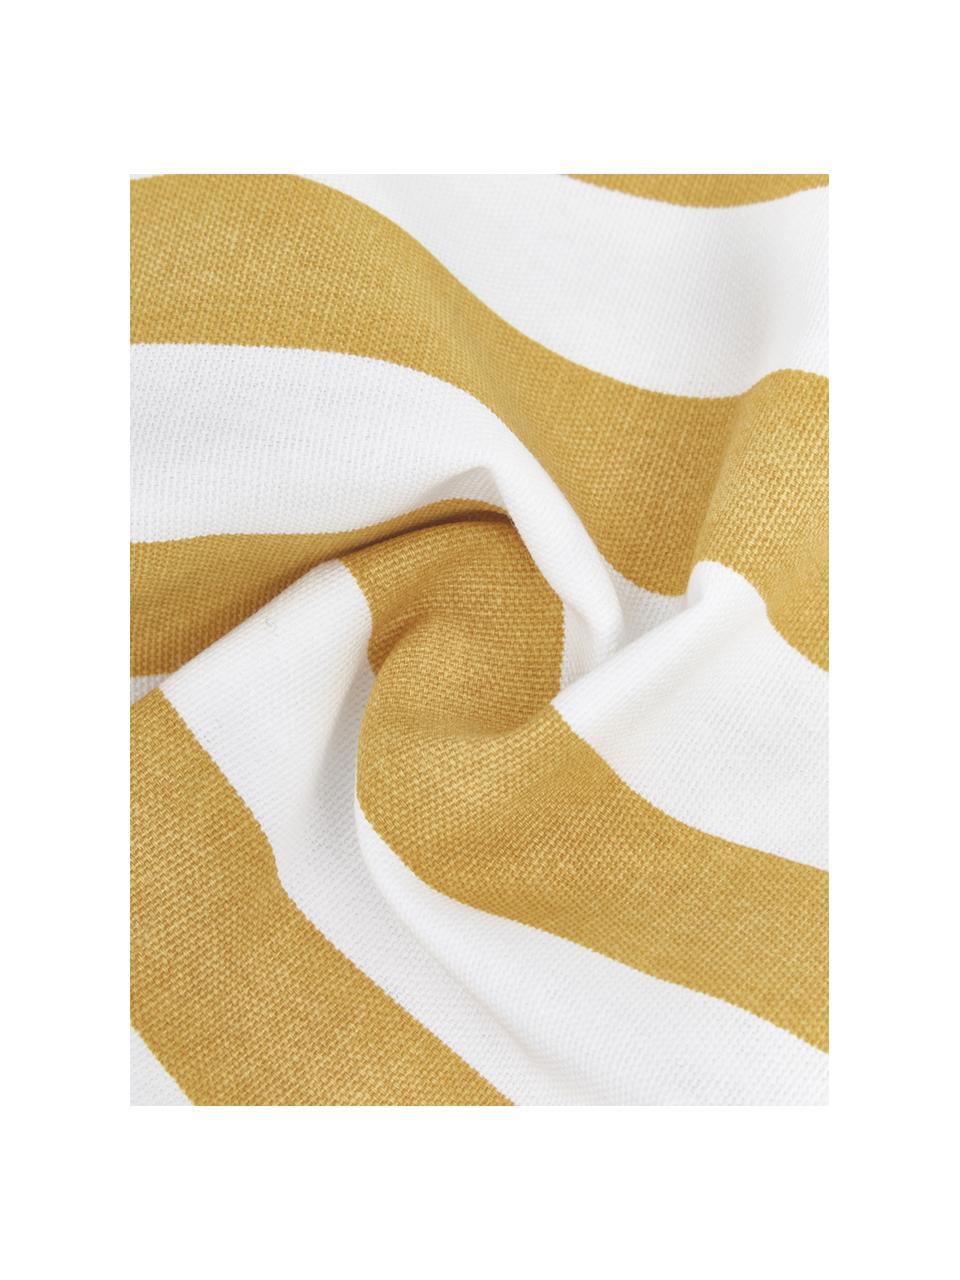 Federa arredo a righe giallo/bianco Timon, 100% cotone, Giallo, bianco, Larg. 50 x Lung. 50 cm